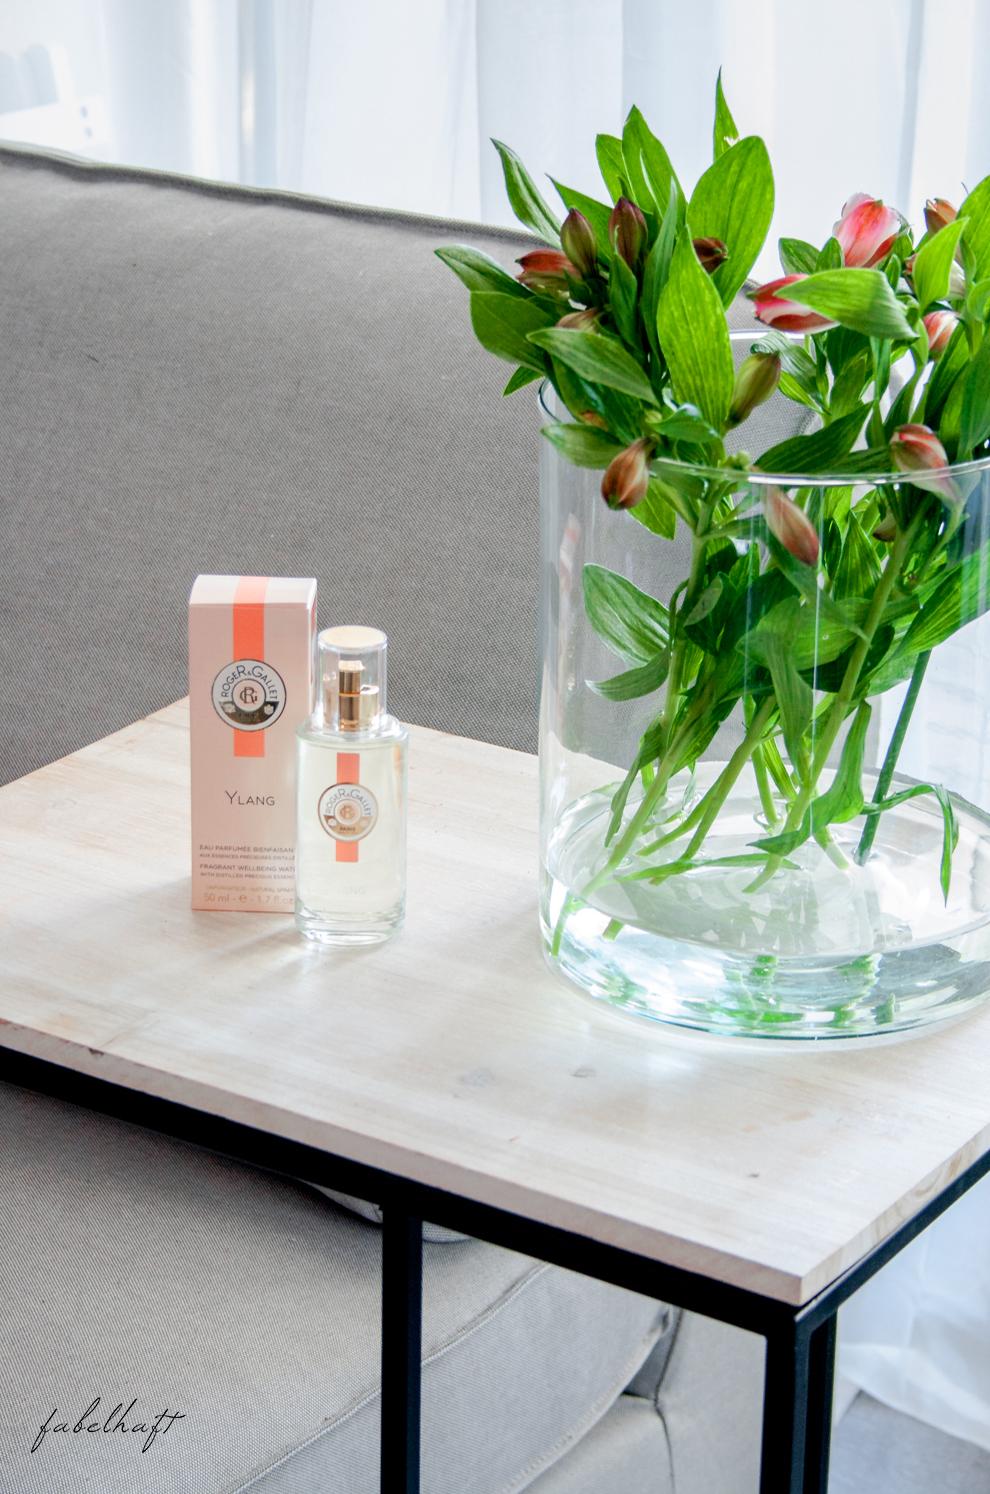 Flaconi Roger Gallet Ylang Beauty Blogger Parfum Lounge Interior Grey Grau Sommer 5